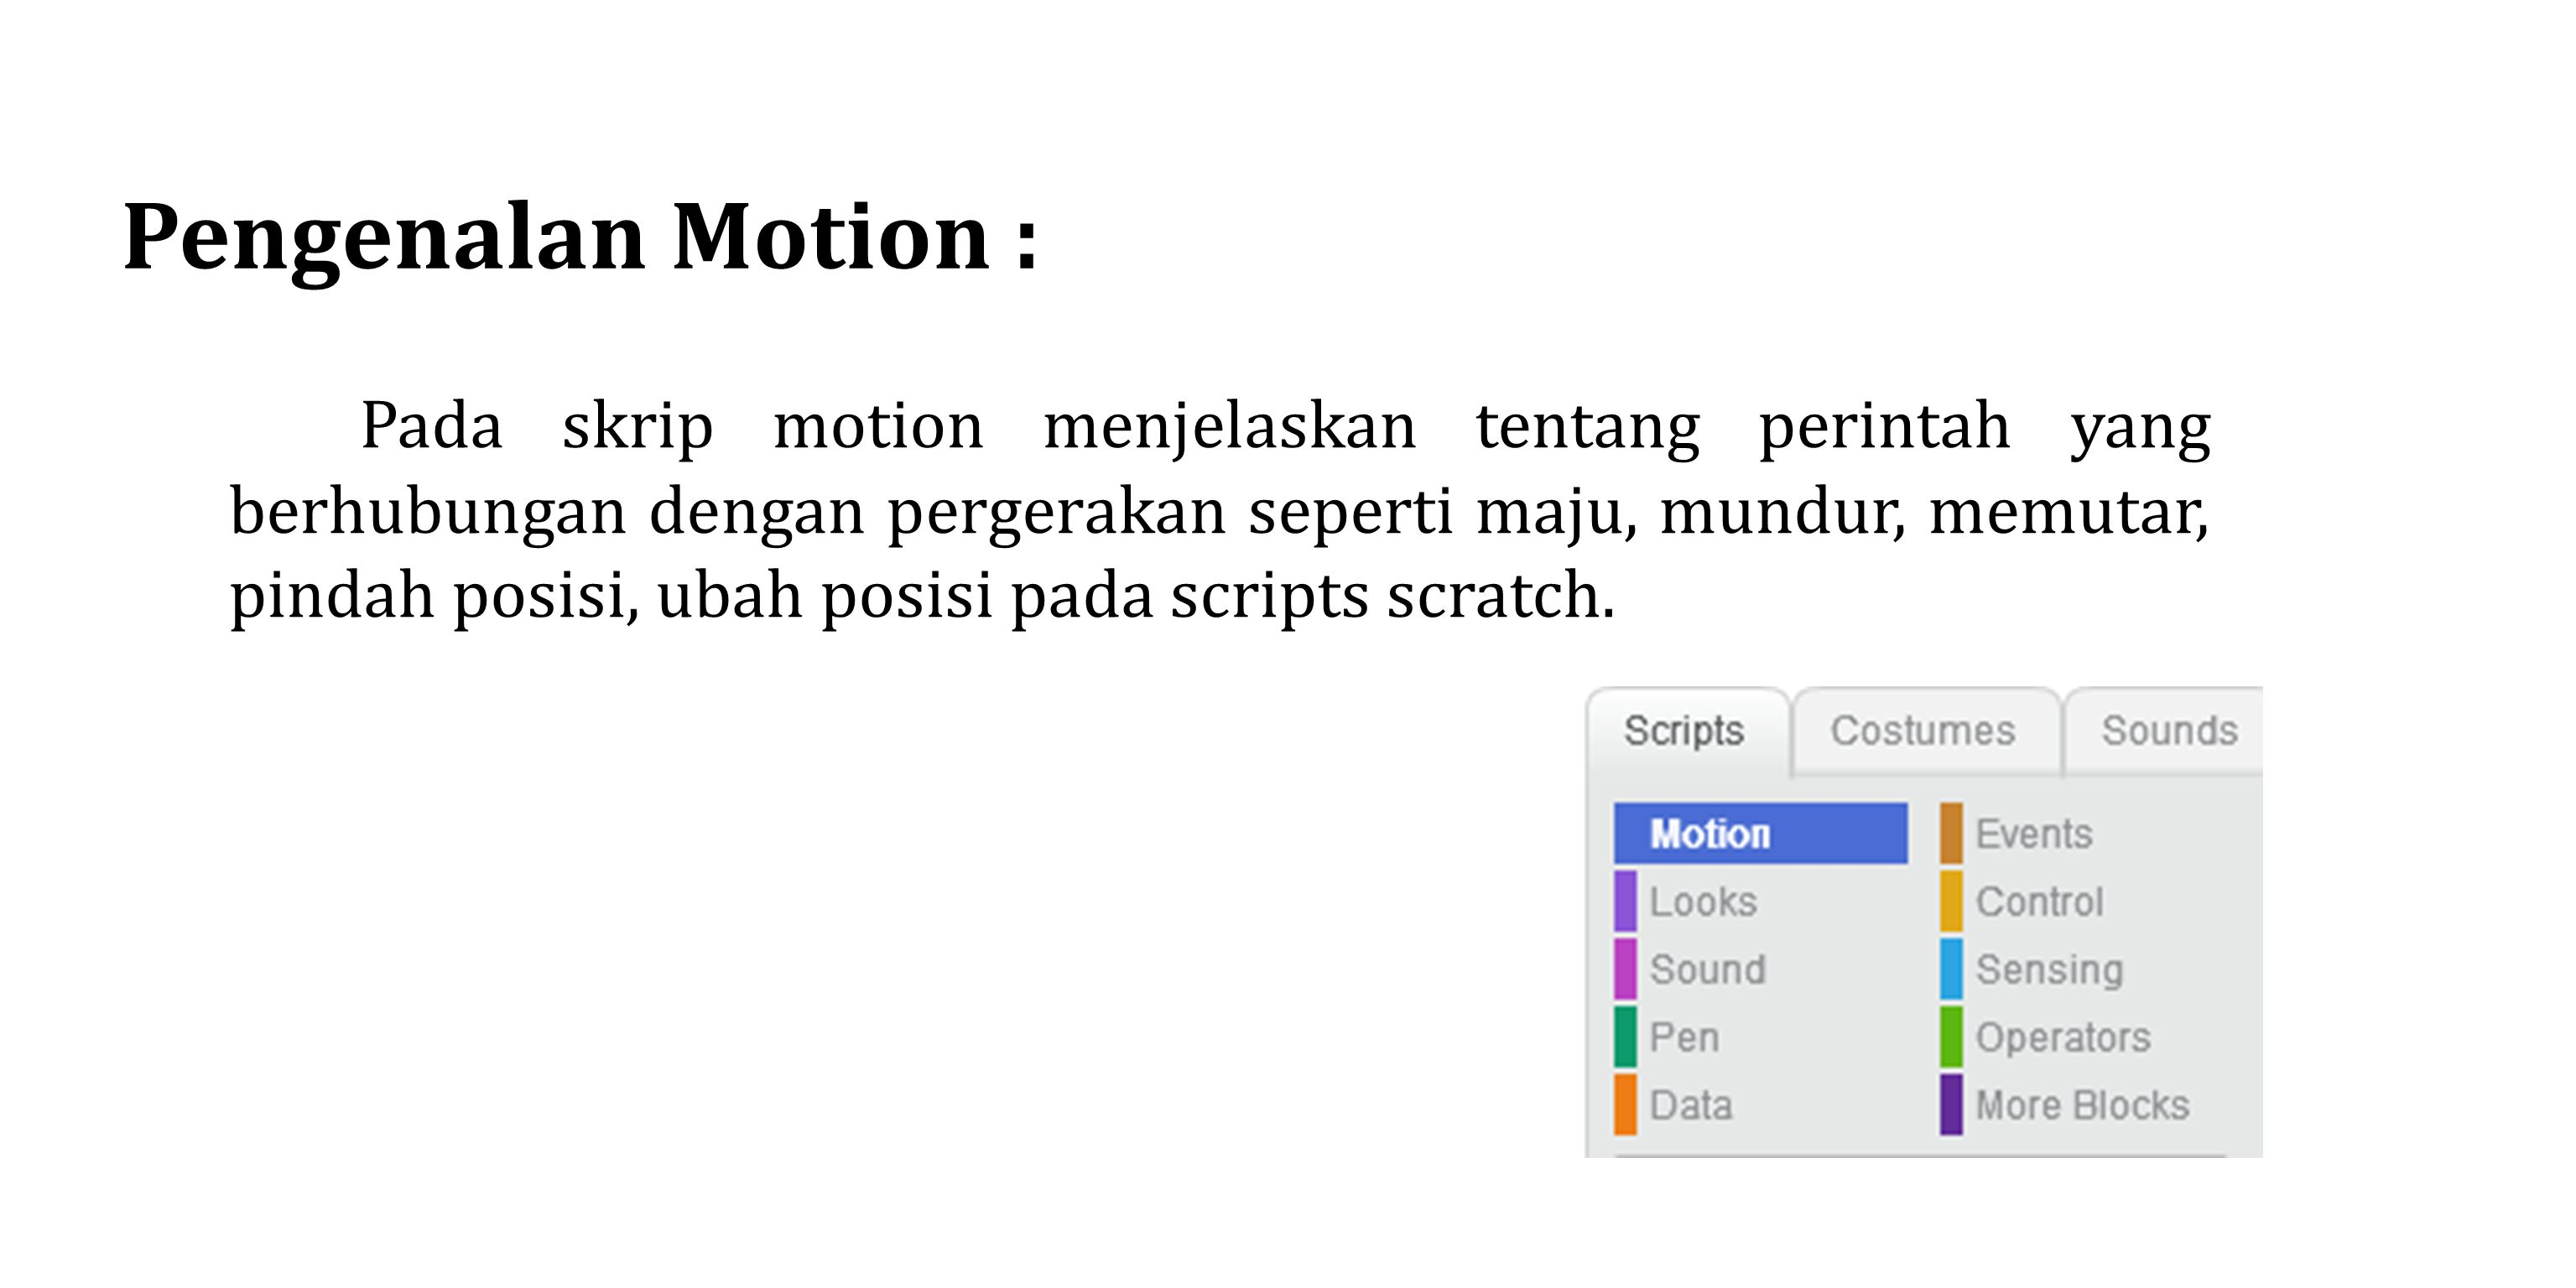 Pengenalan Motion :